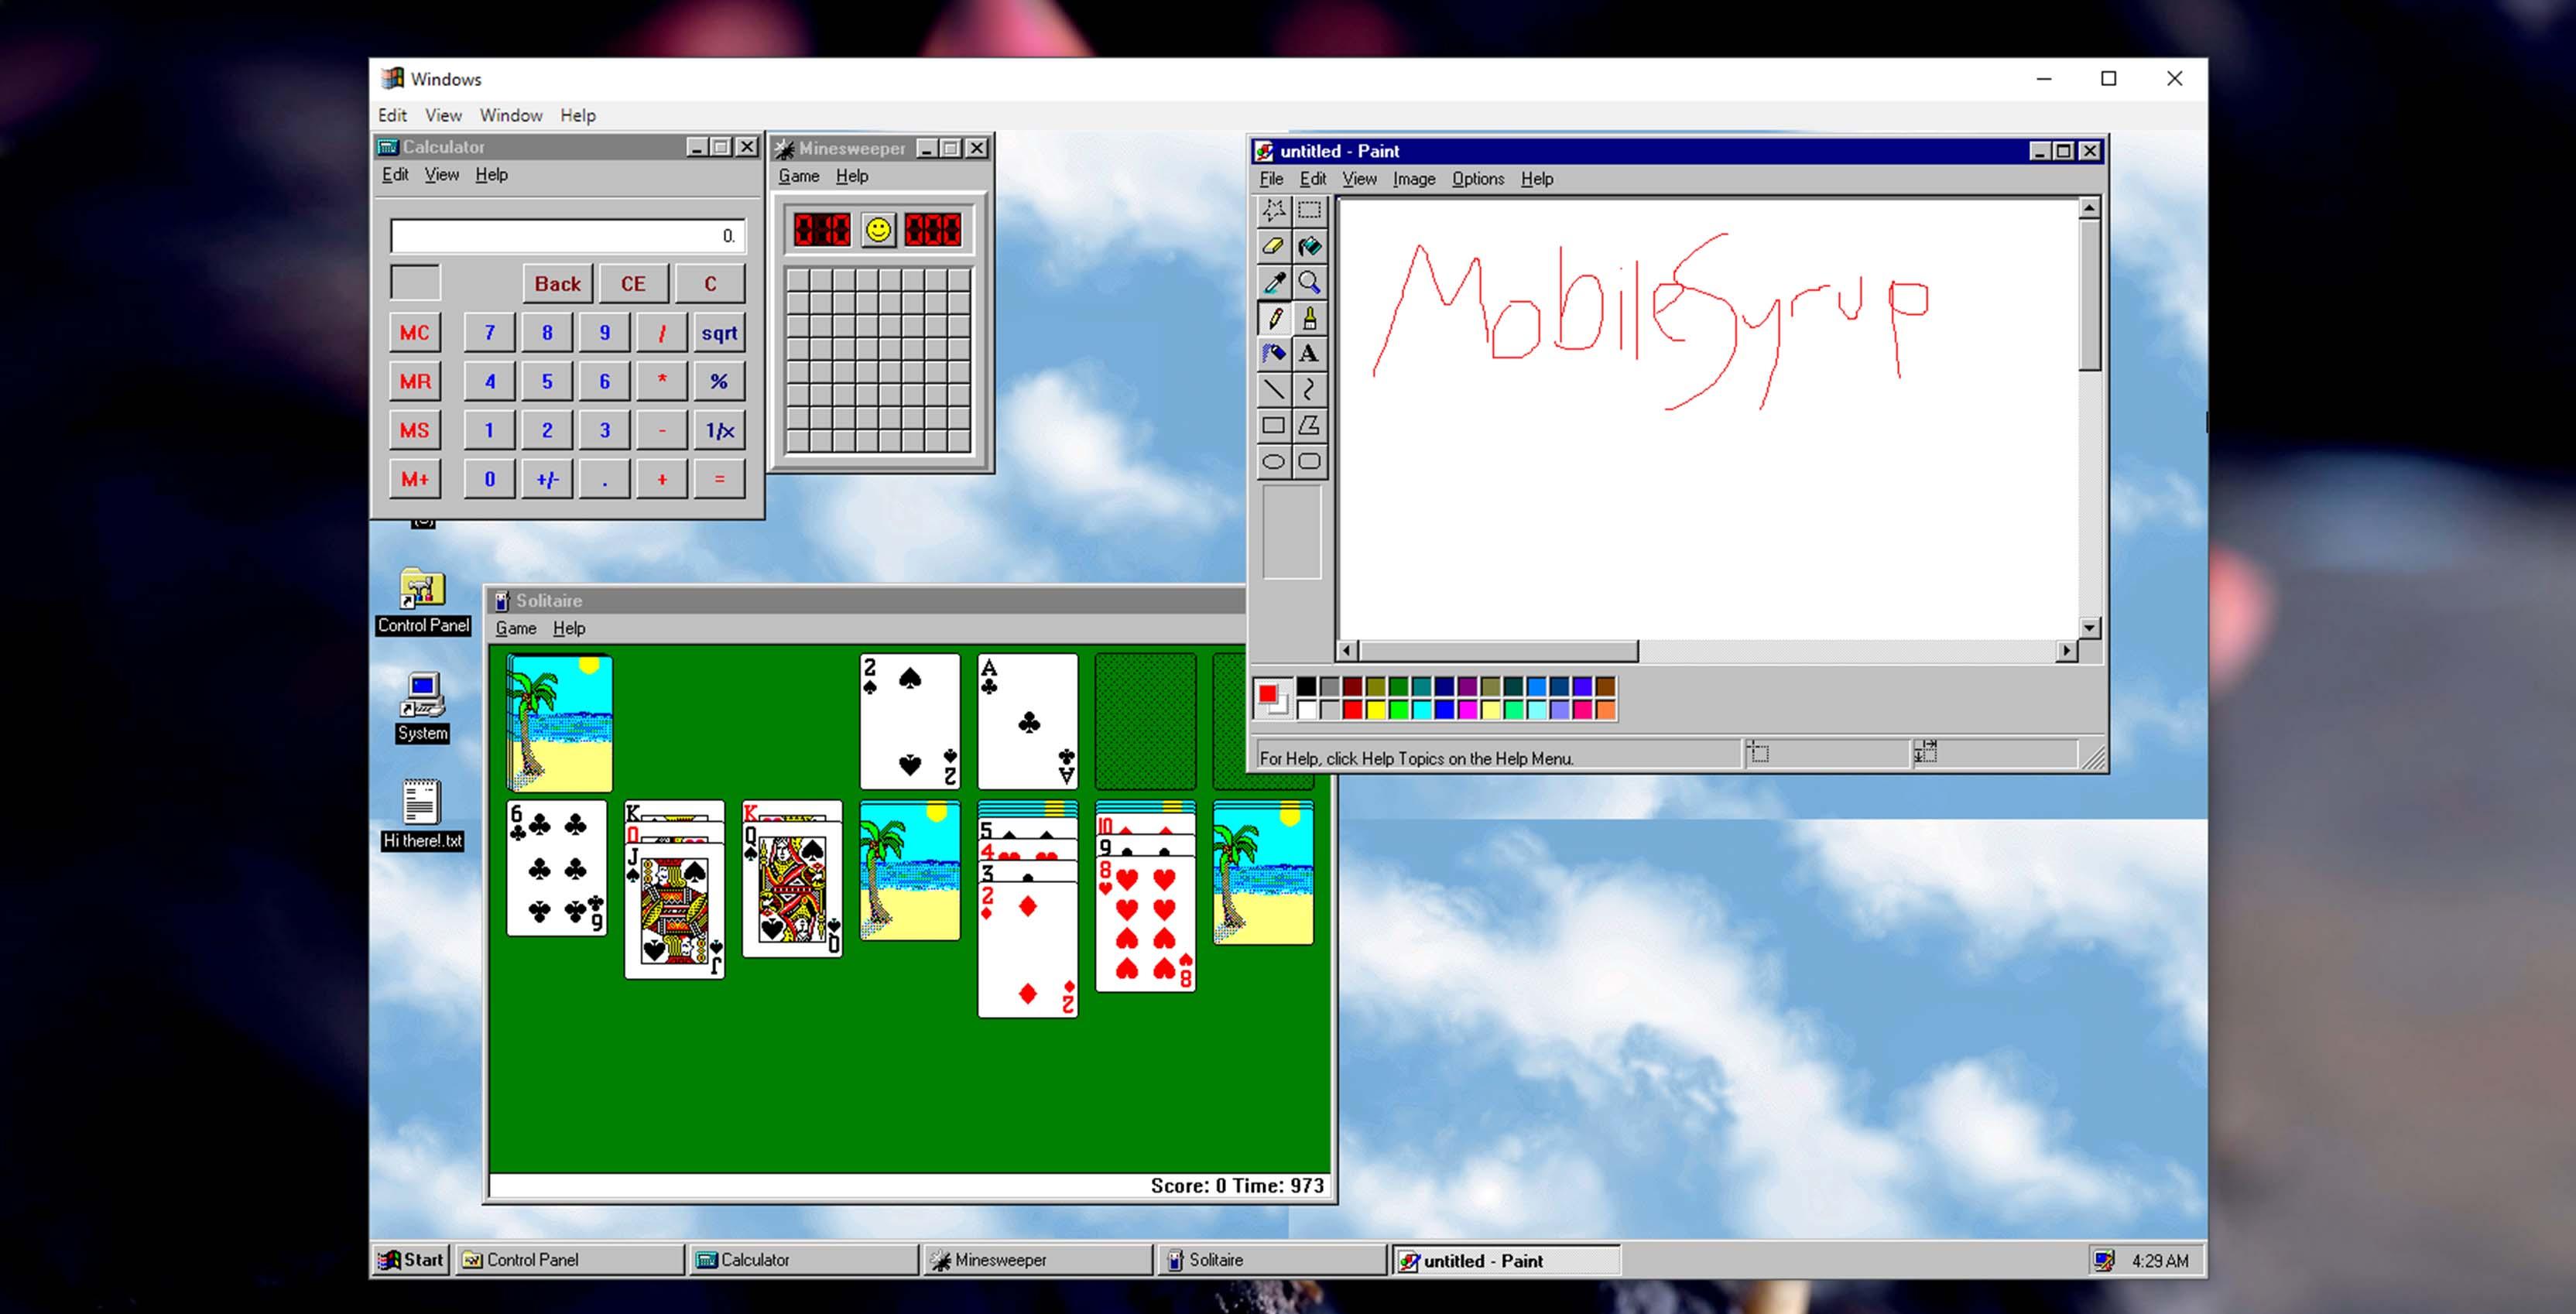 Windows 95 application